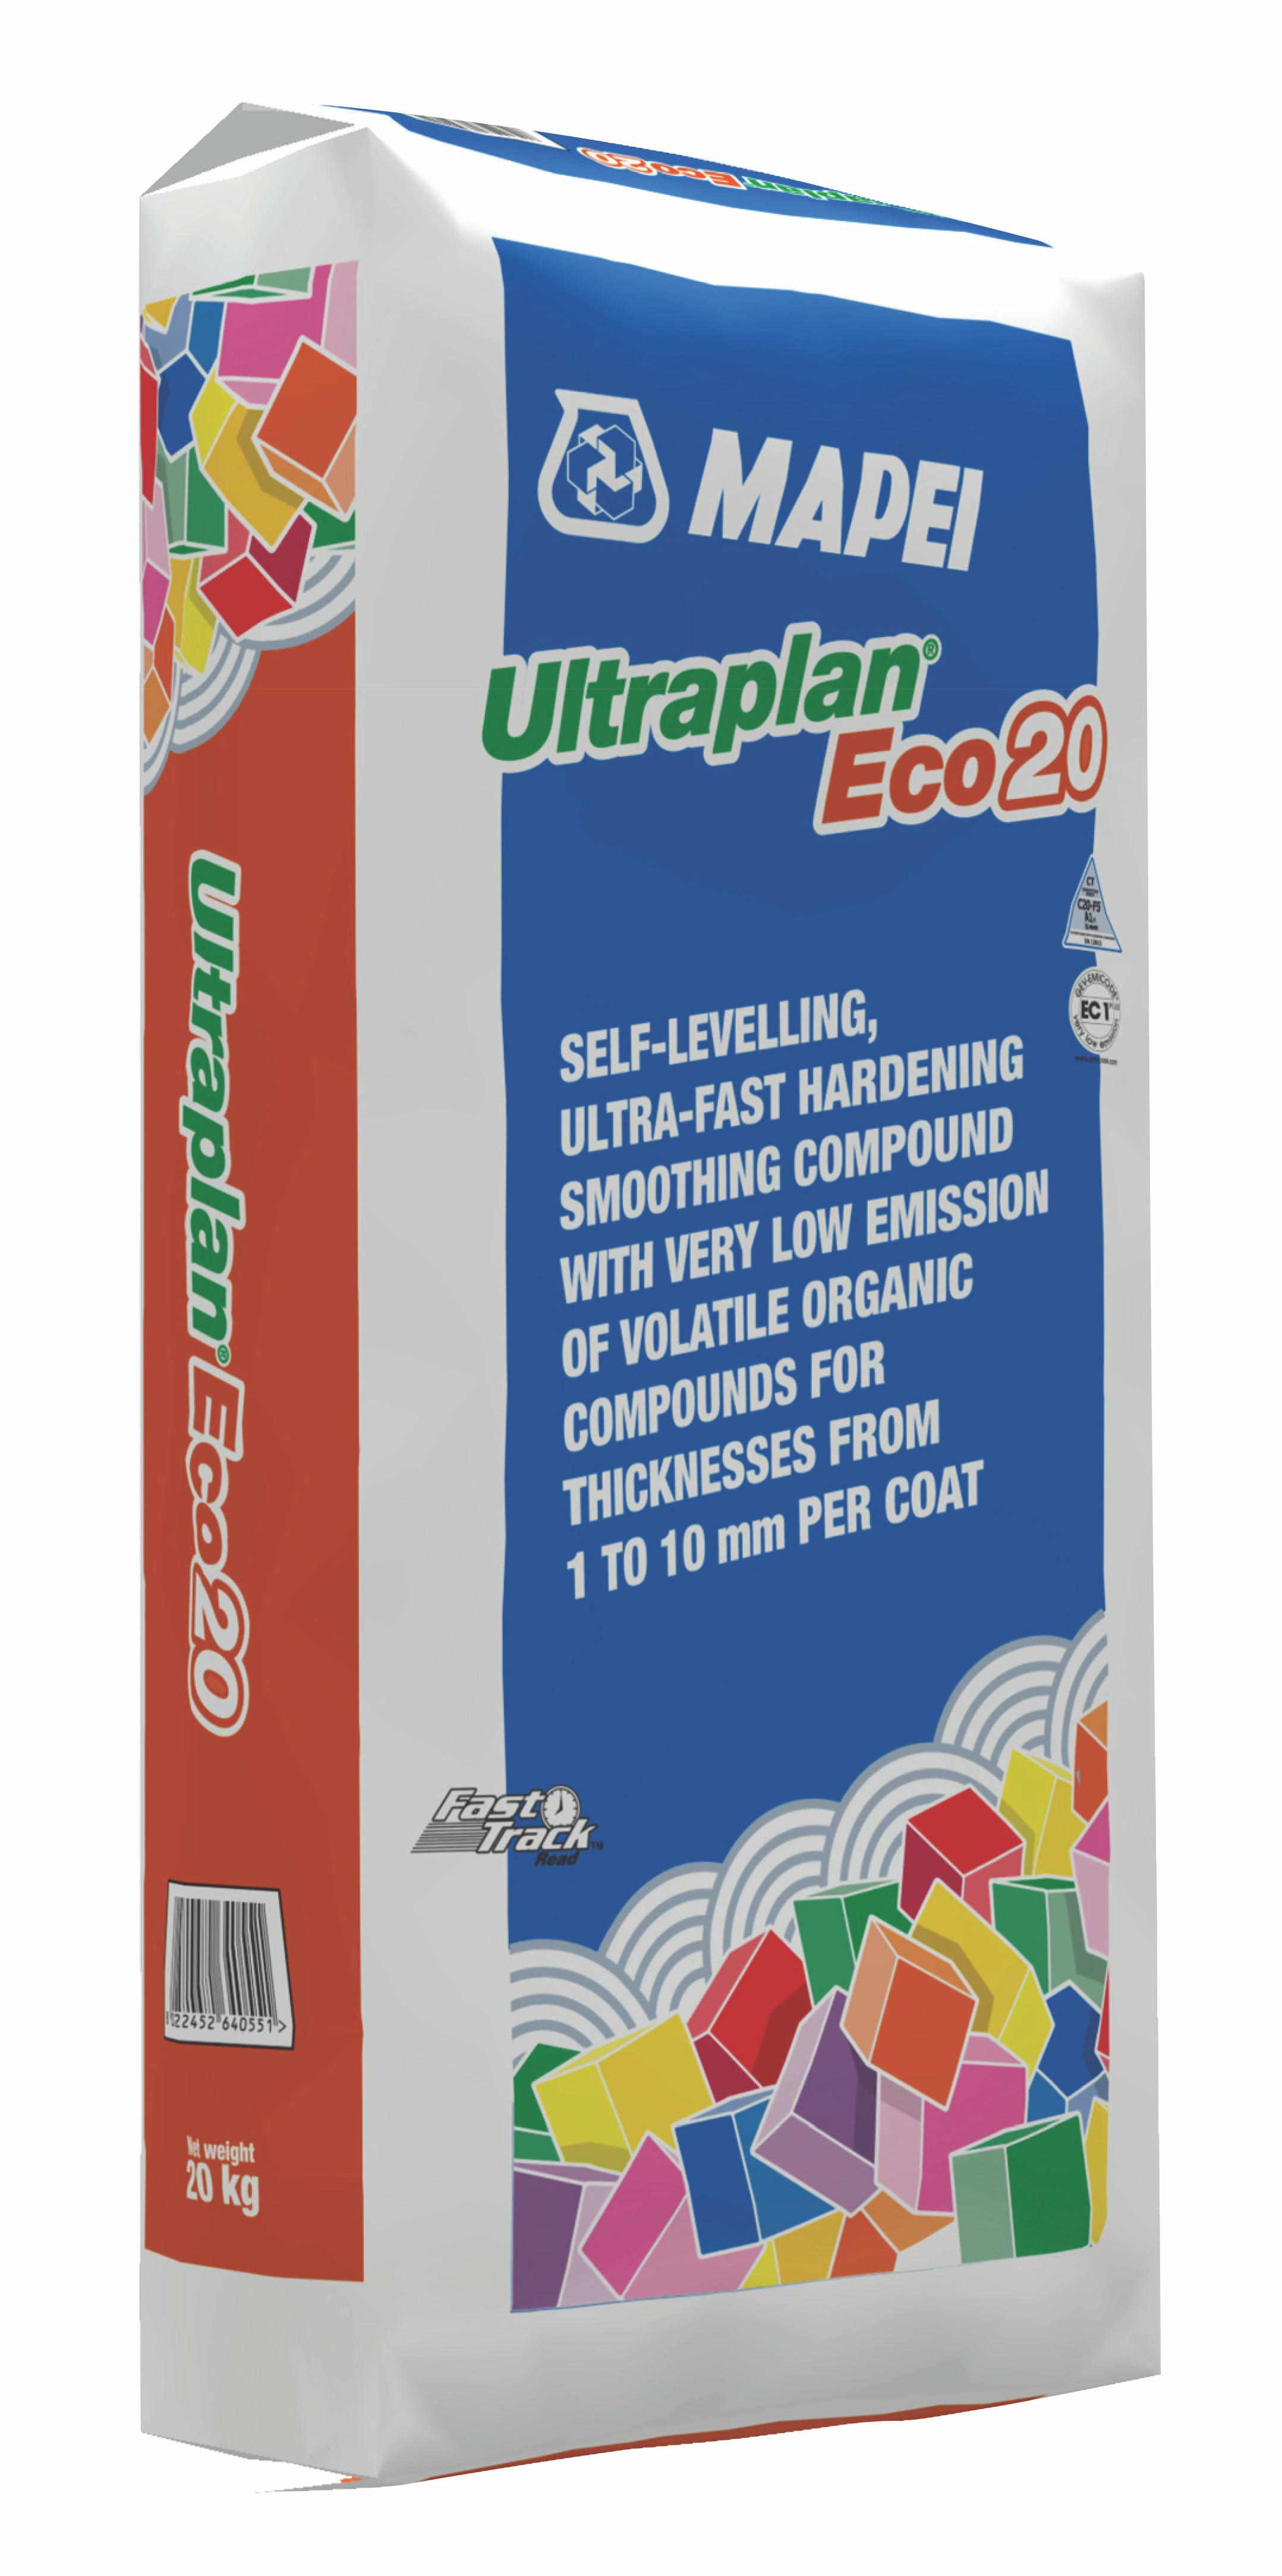 202003133_mapei_ultraplan_eco20_20kg_3D